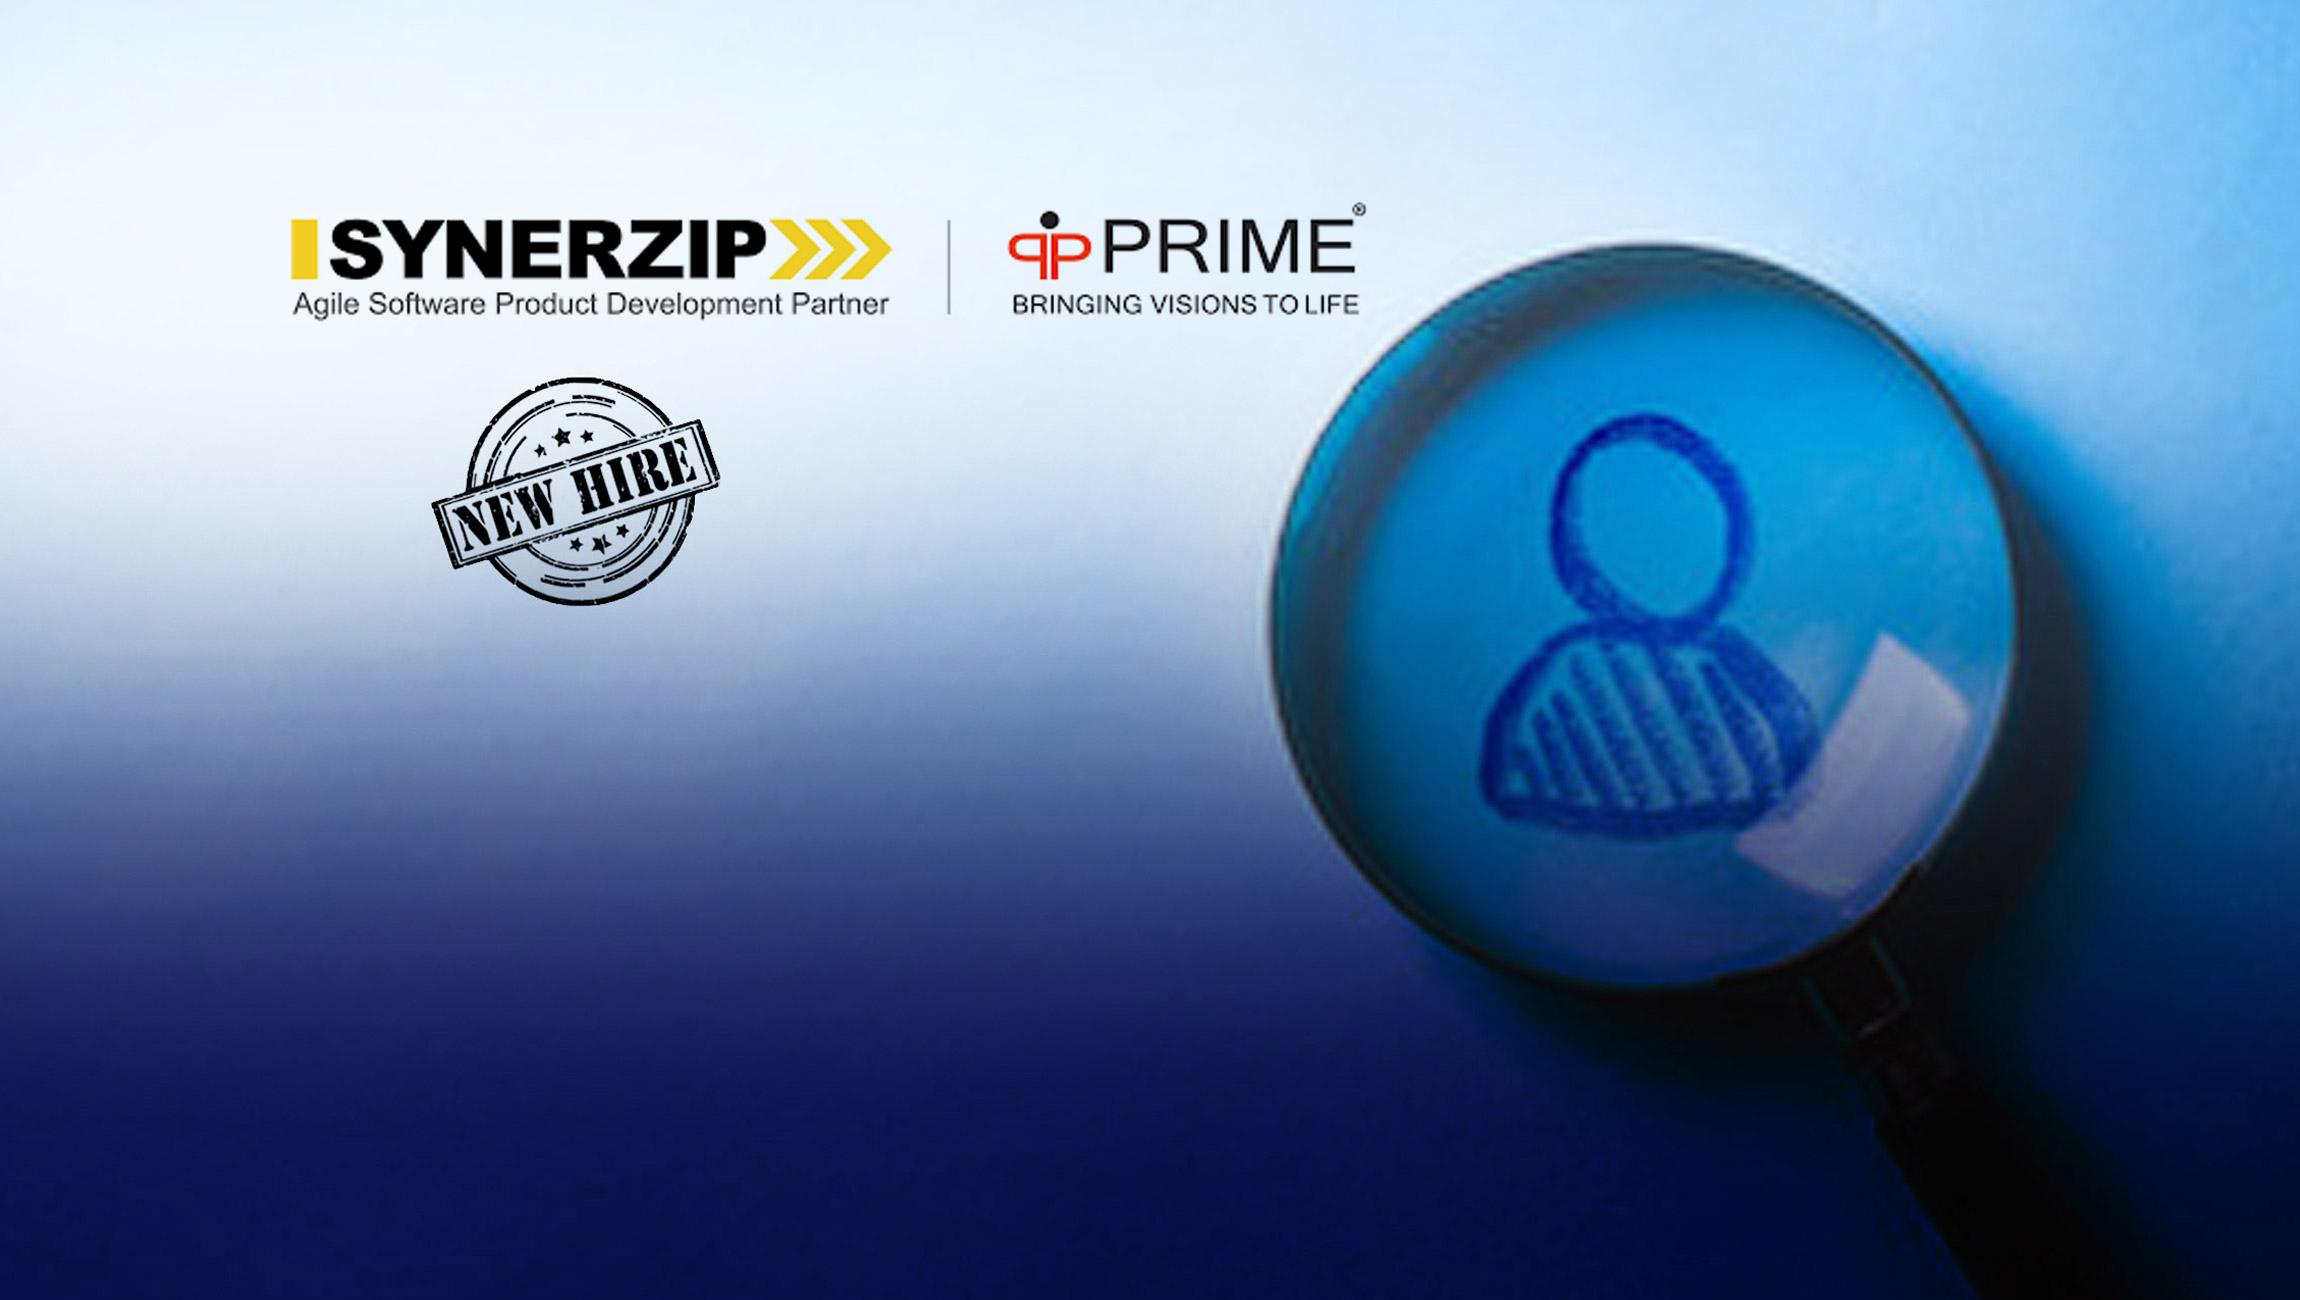 Nick Sharma Announced As CEO To Lead Synerzip/Prime 1